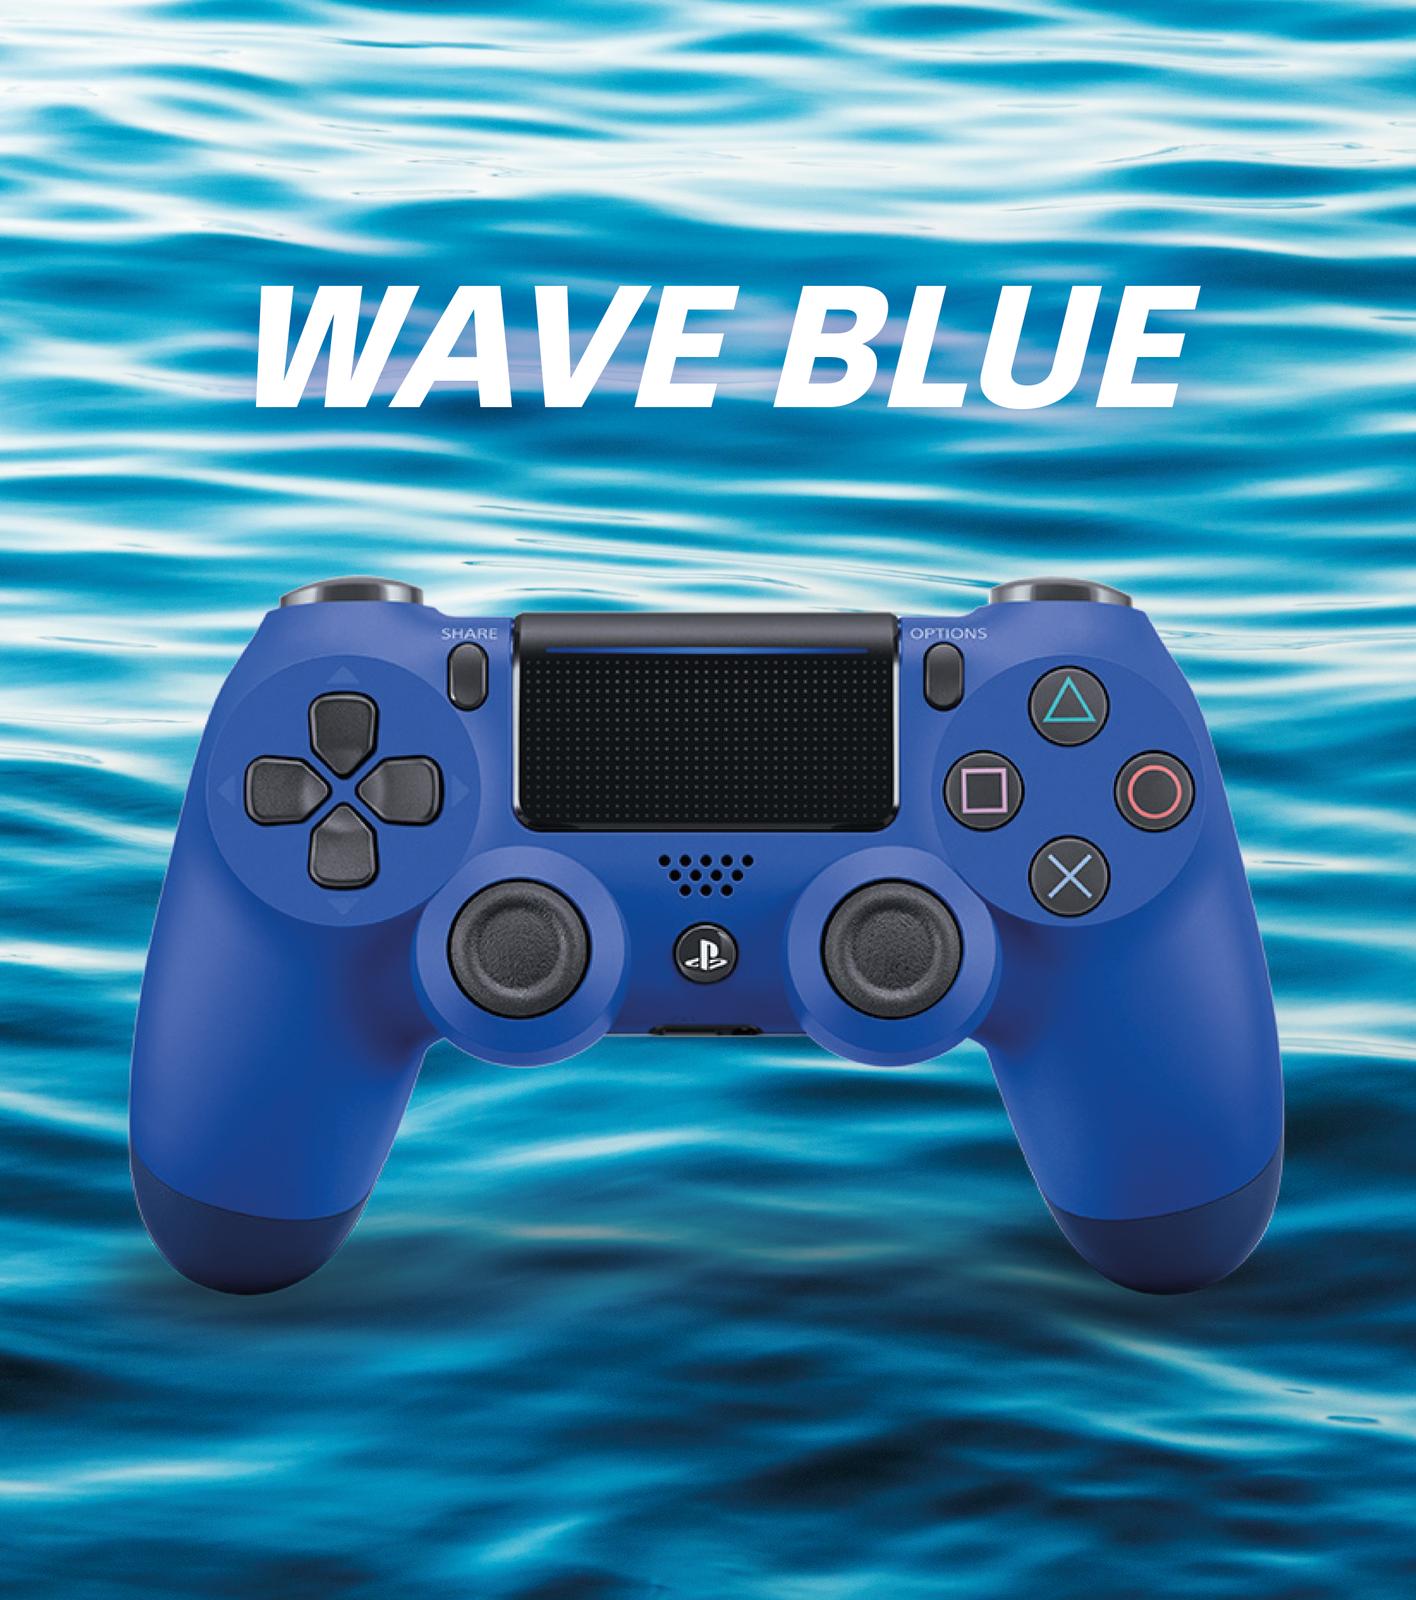 PlayStation 4 DualShock 4 v2 Wireless Controller - Wave Blue for PS4 image